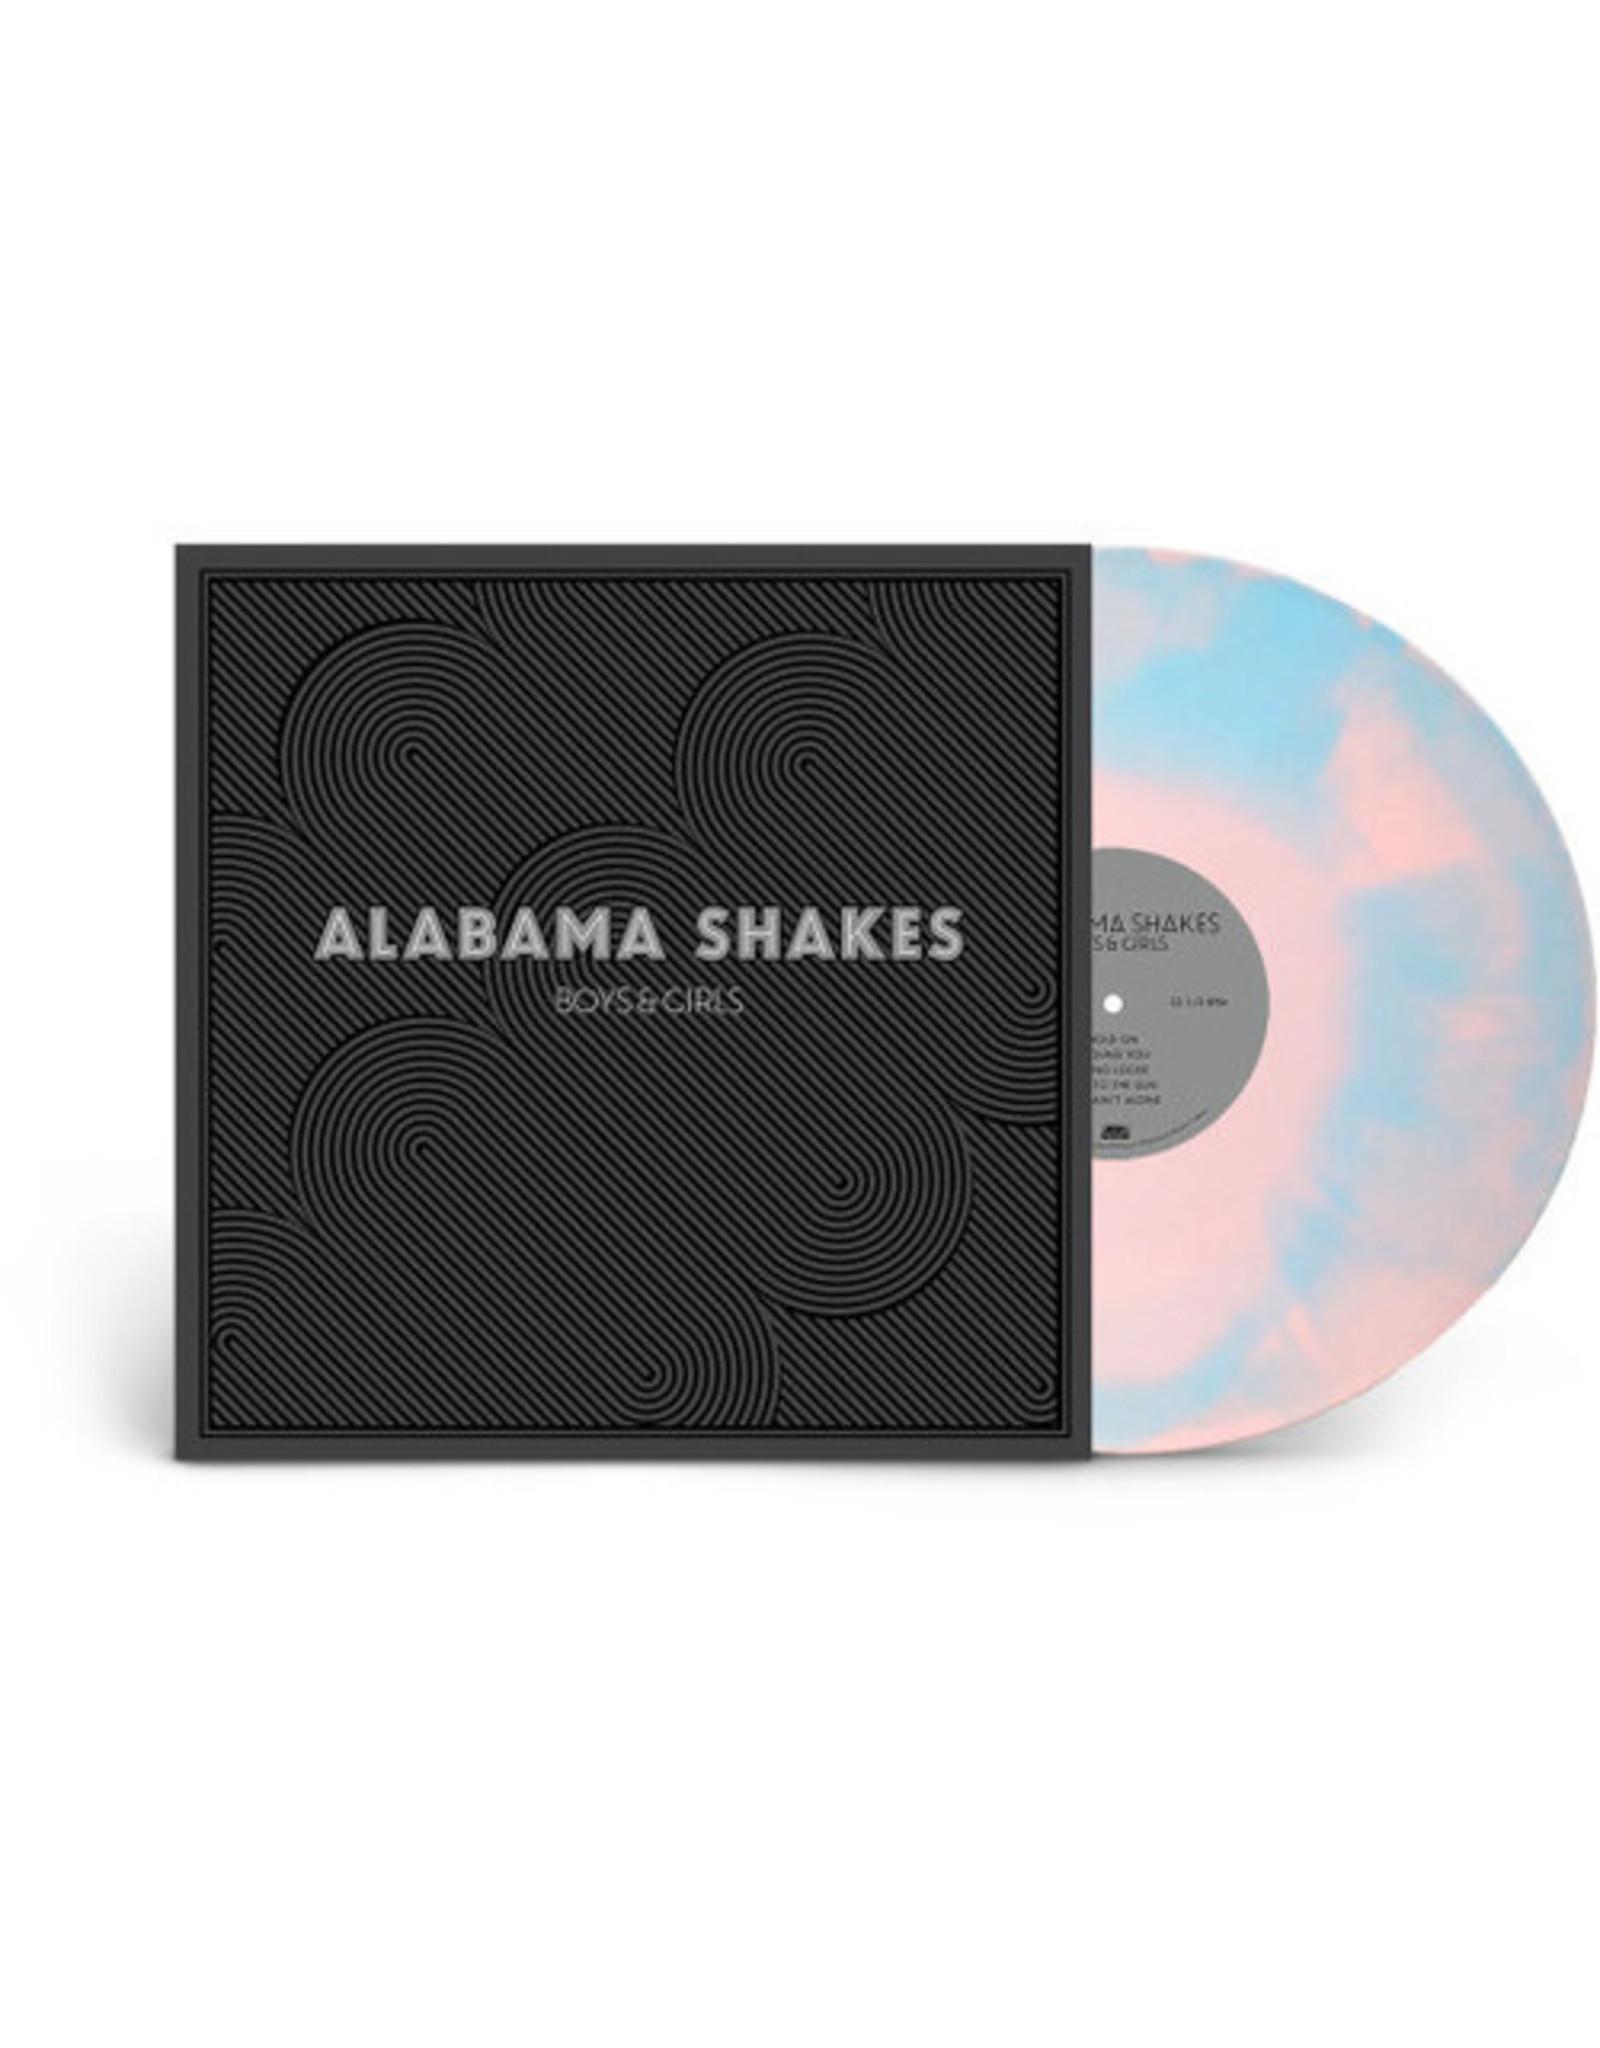 New Vinyl Alabama Shakes - Boys & Girls (Ltd., Colored) LP